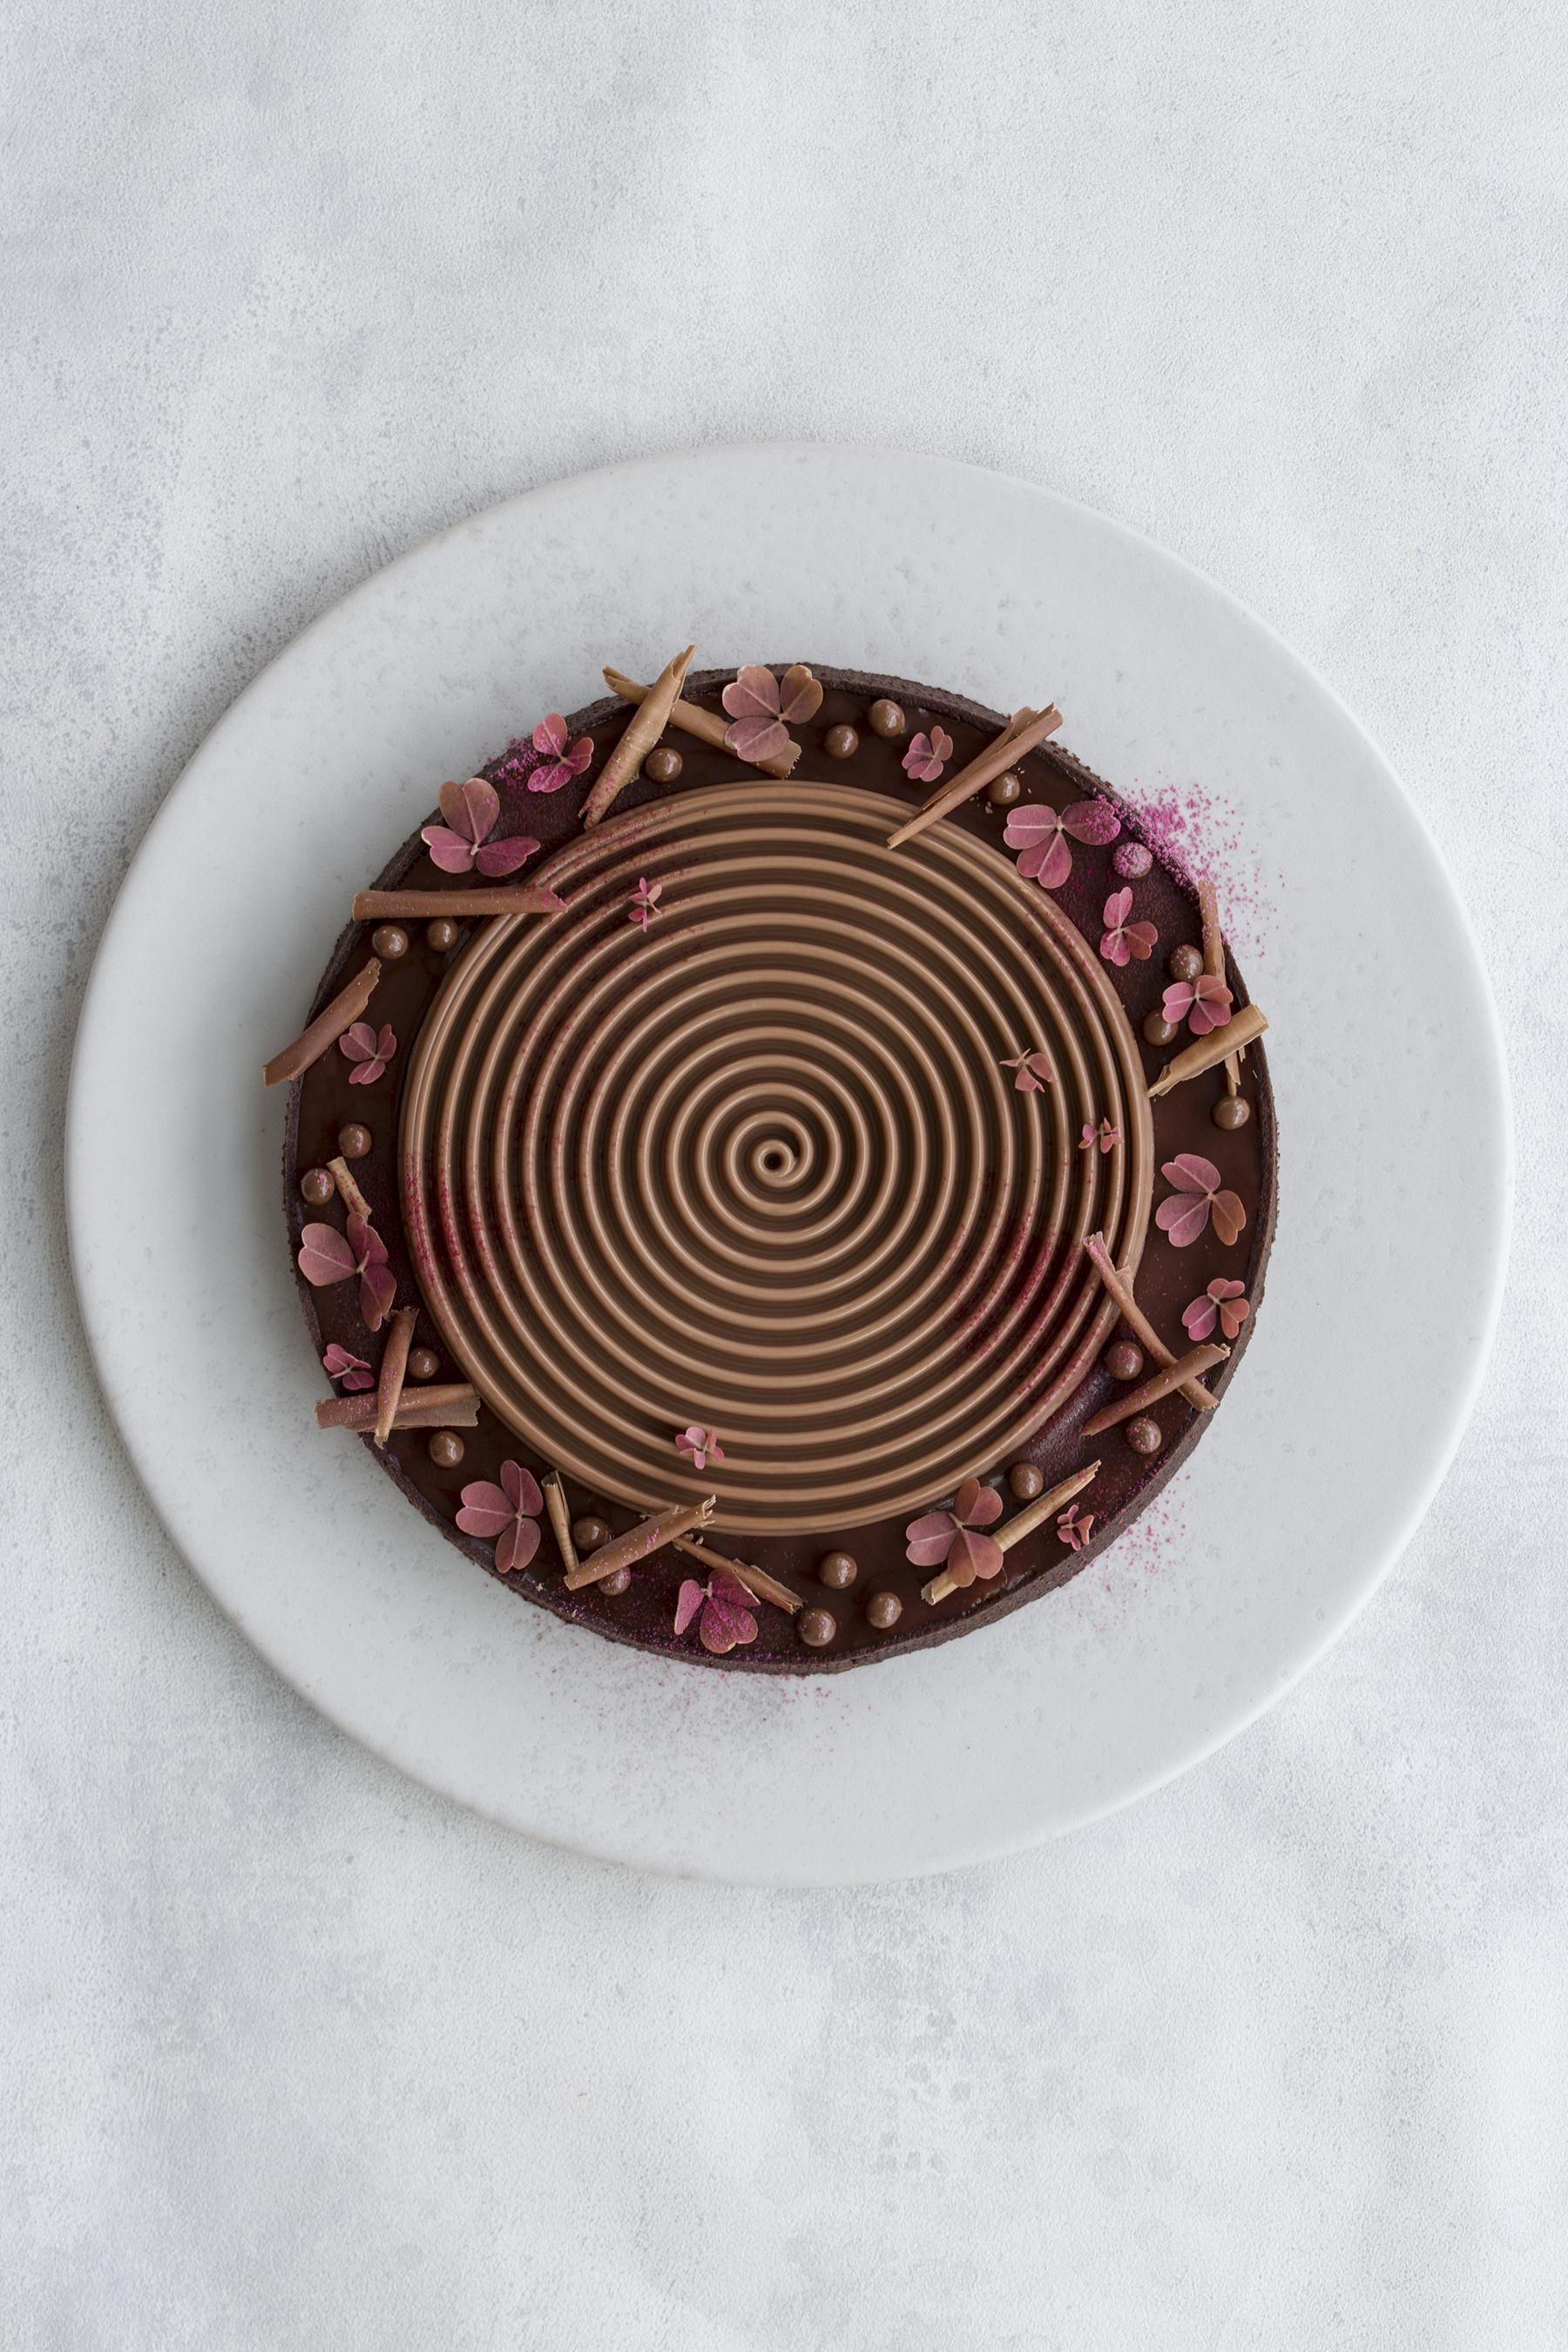 Chokoladetærte med mazarin og kirsebær